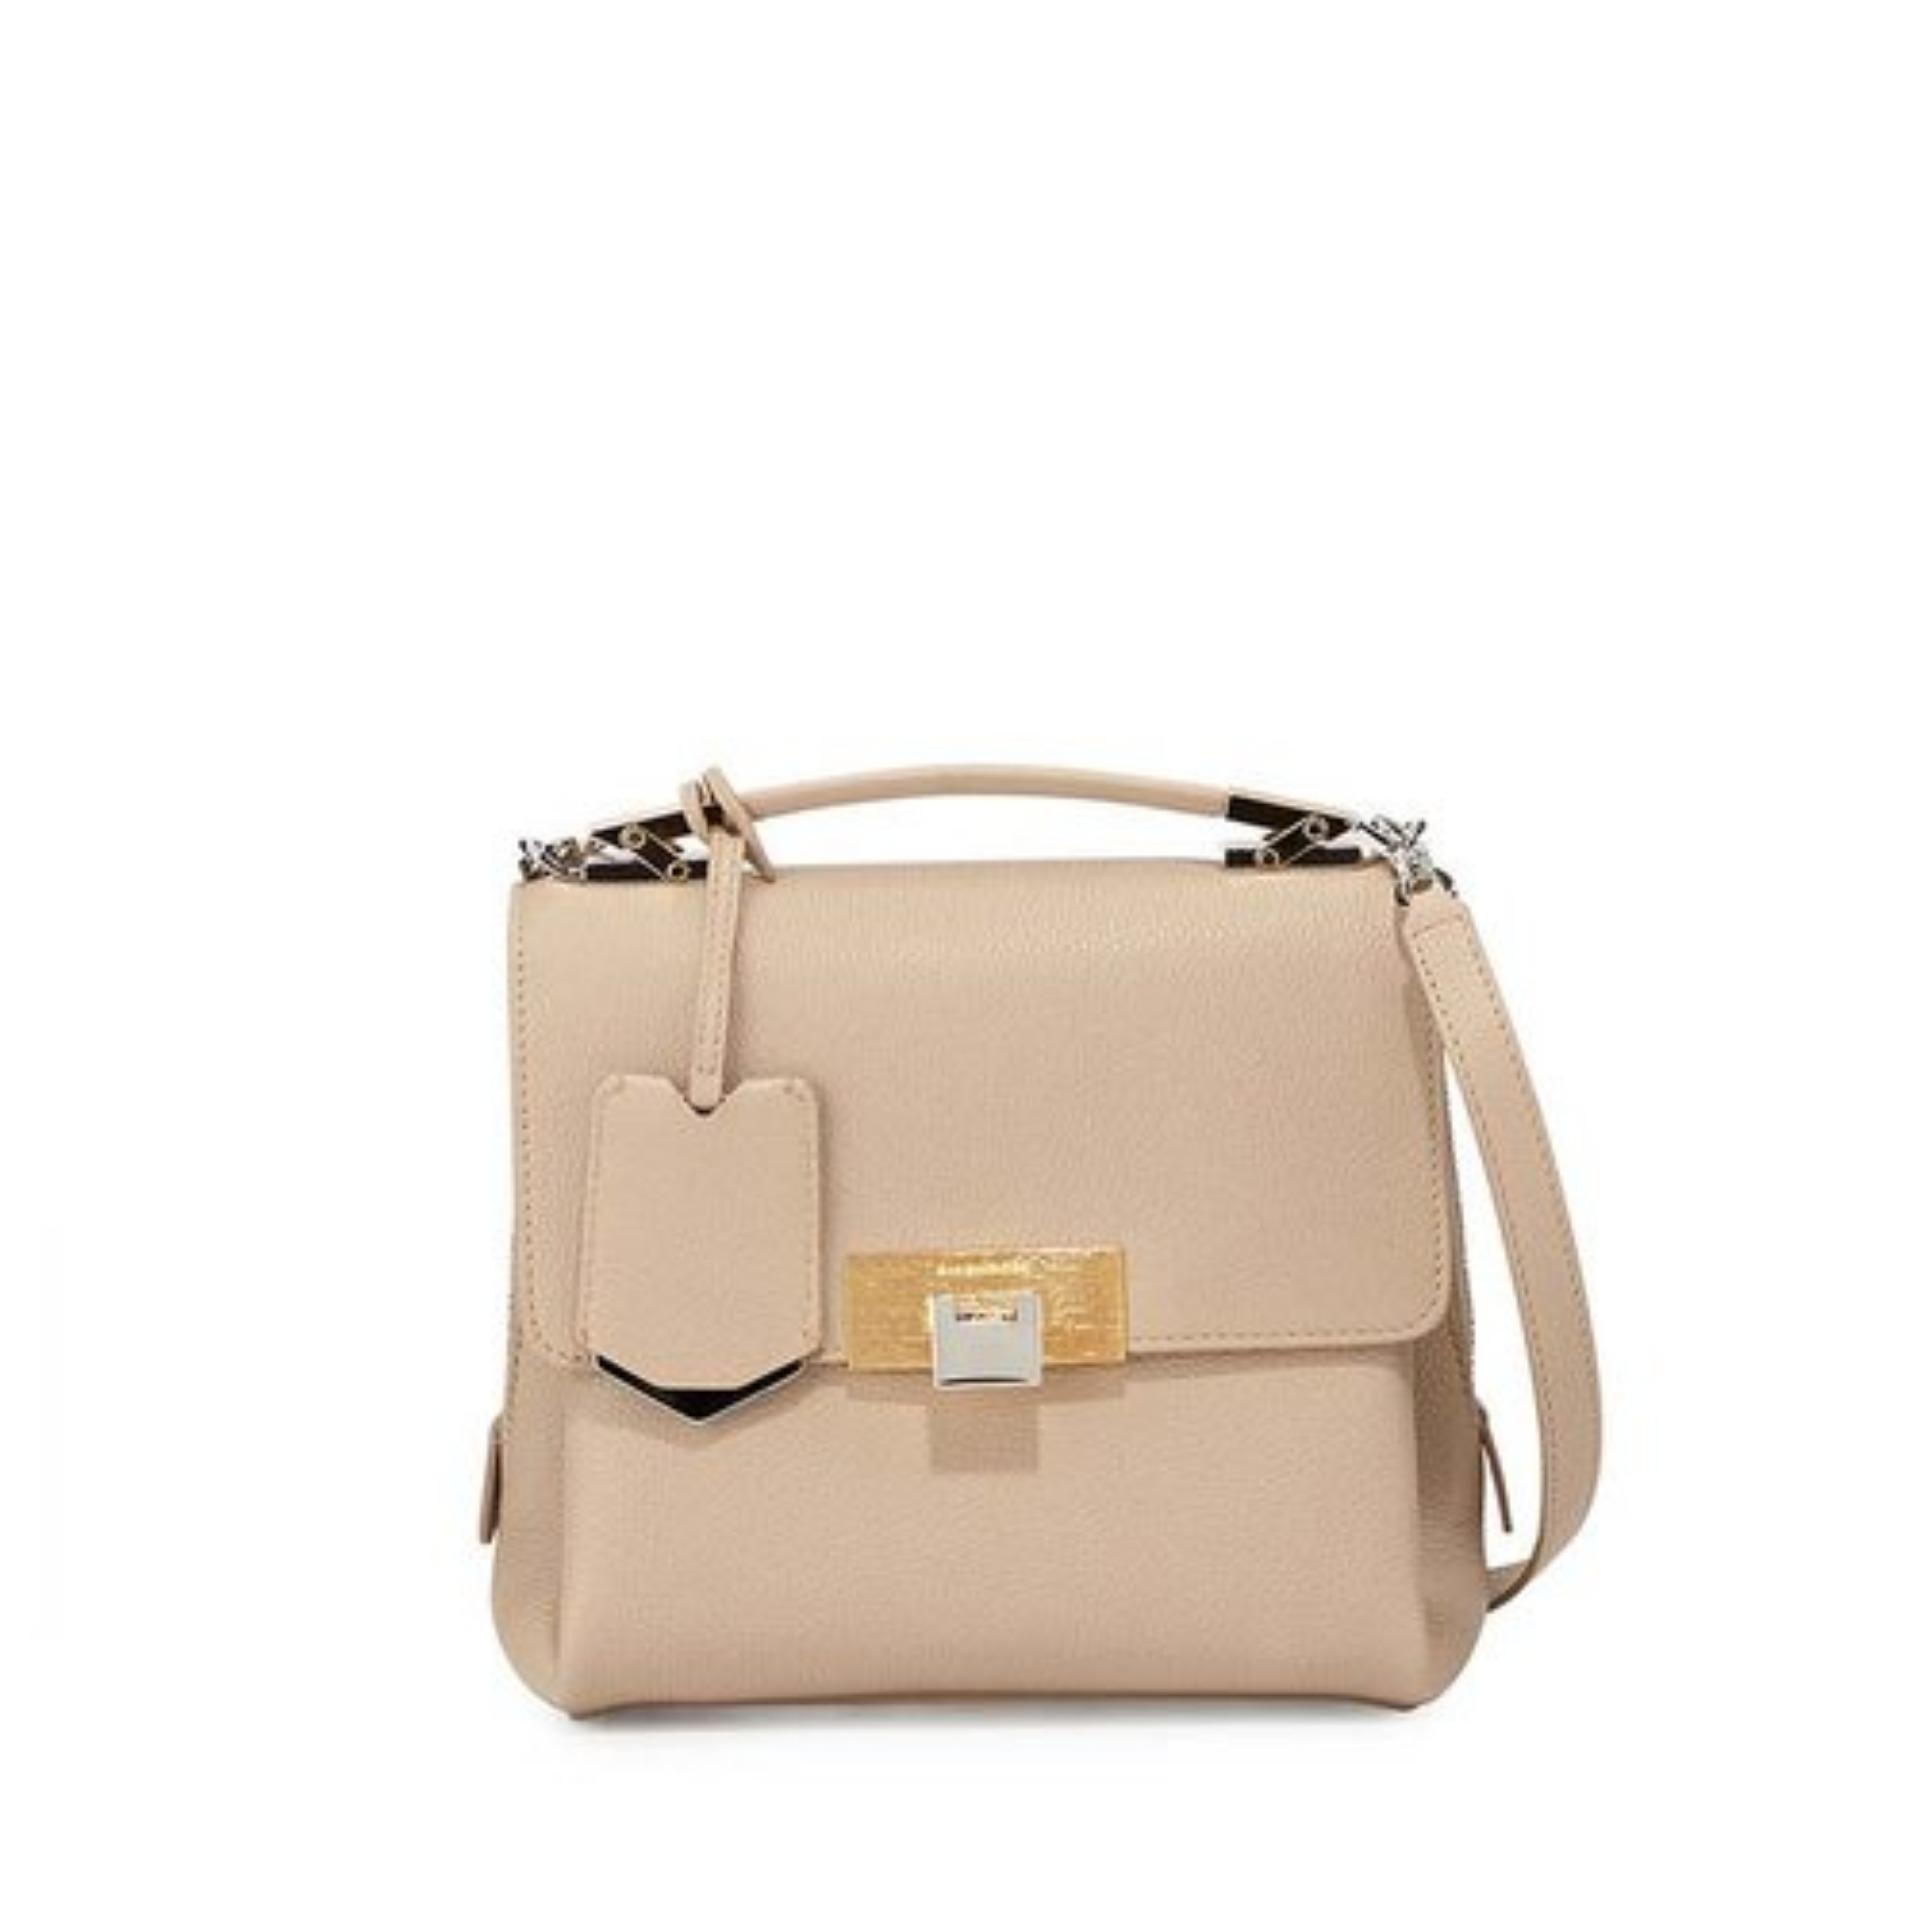 e123c19a39a Latest Balenciaga Women Bags Products | Enjoy Huge Discounts | Lazada SG